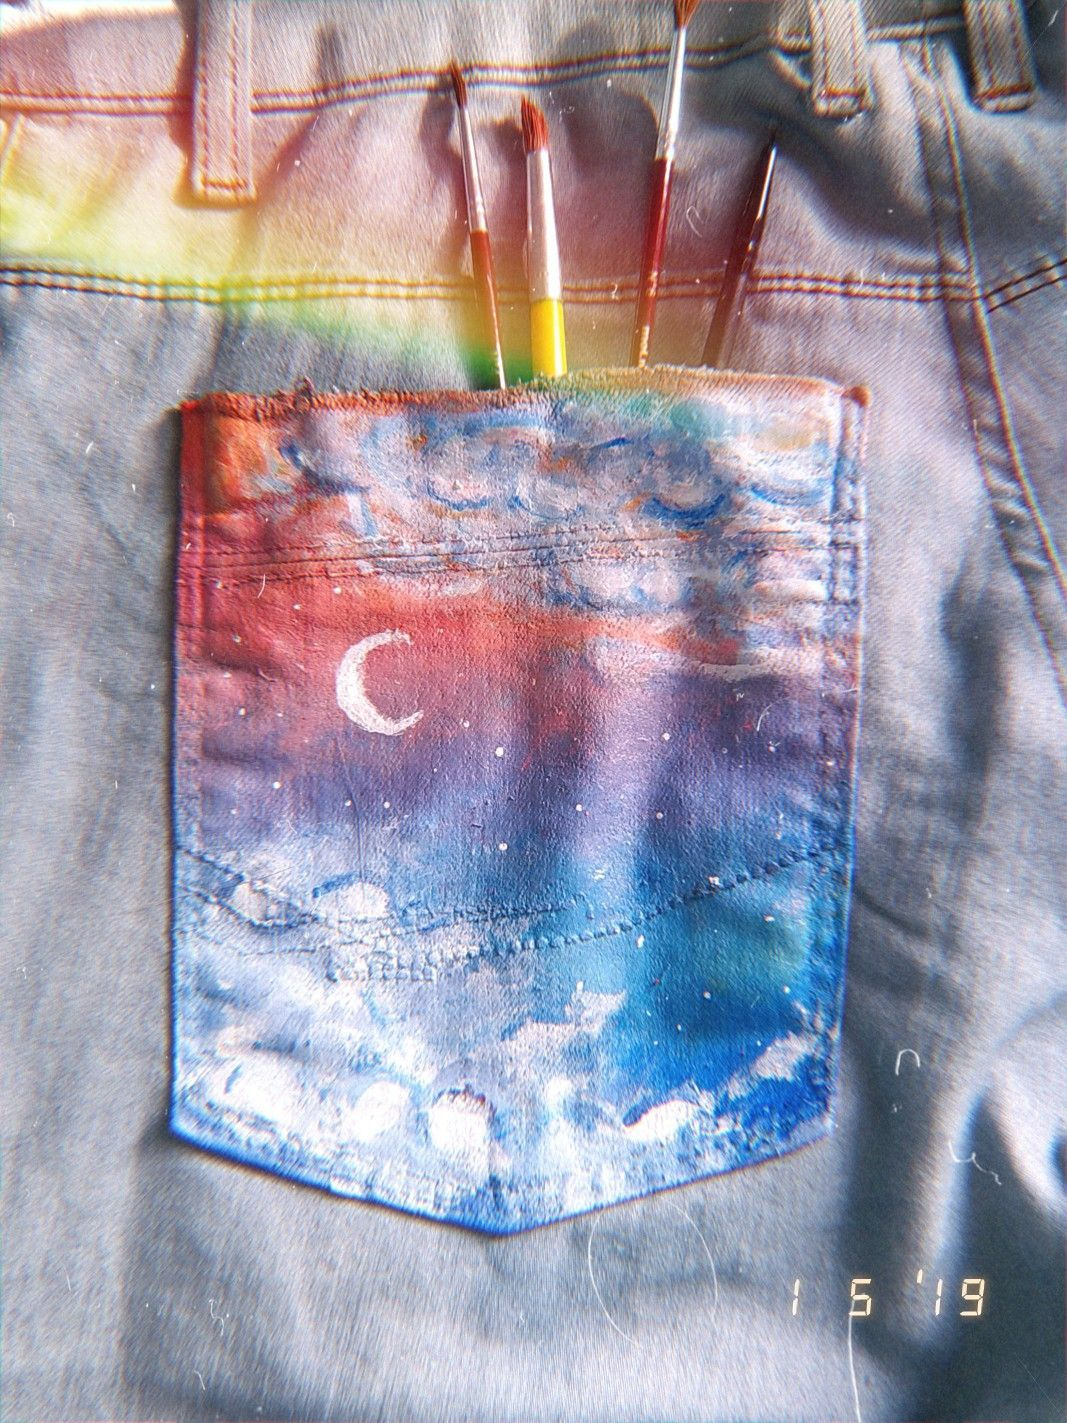 Painted pocket : ? #Painted #pocket